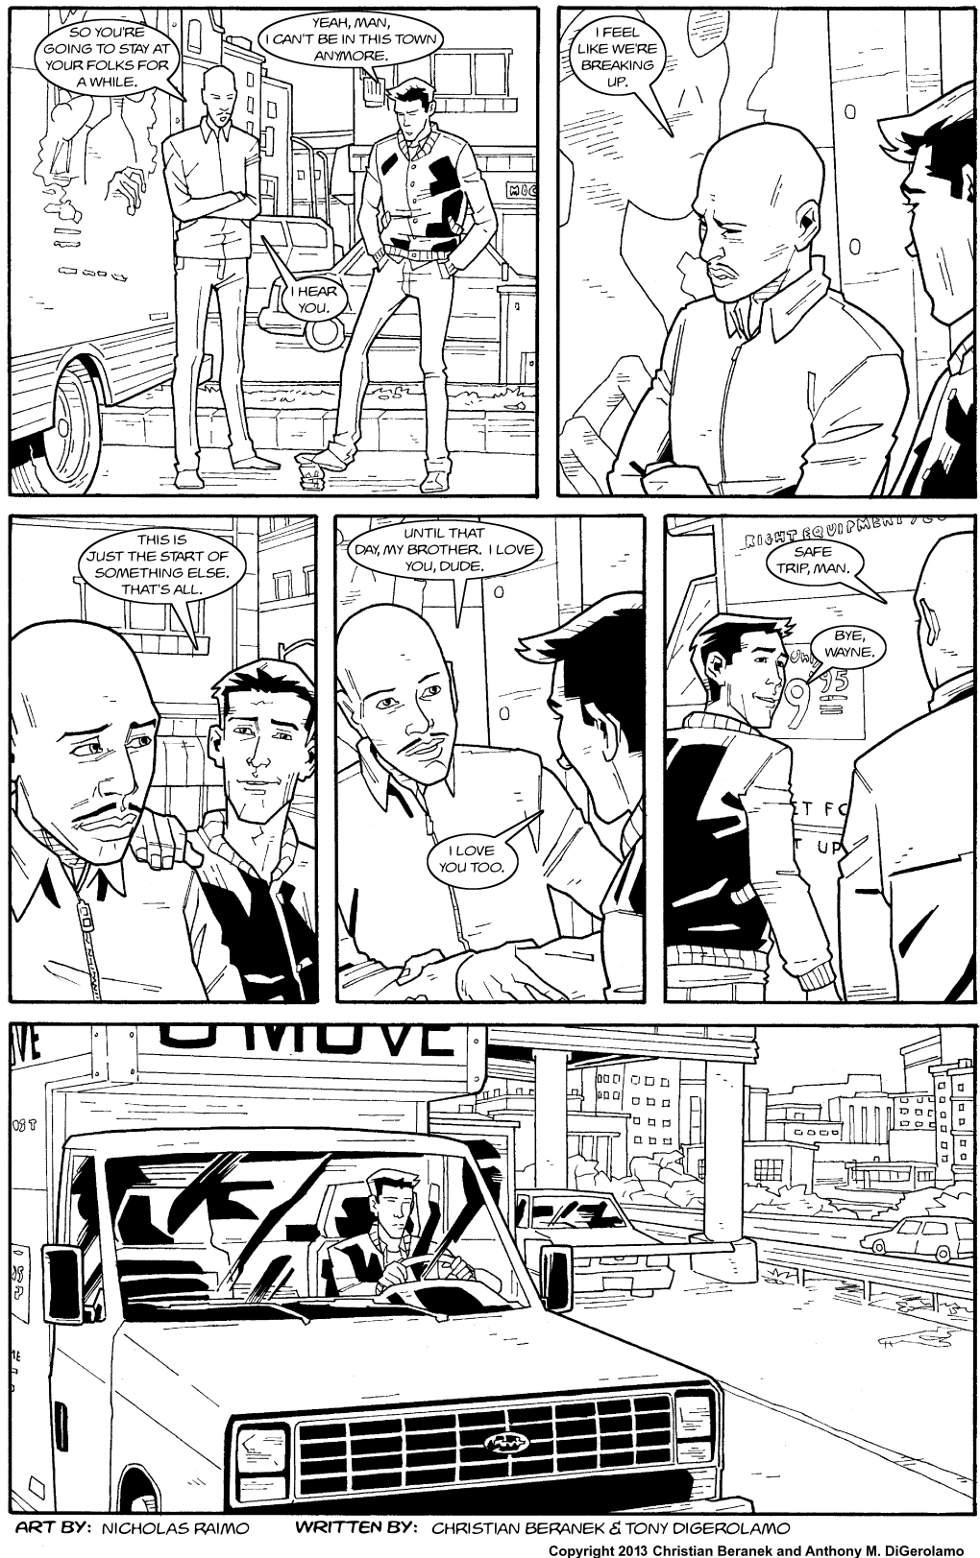 Dealers: The Last Conan Shake